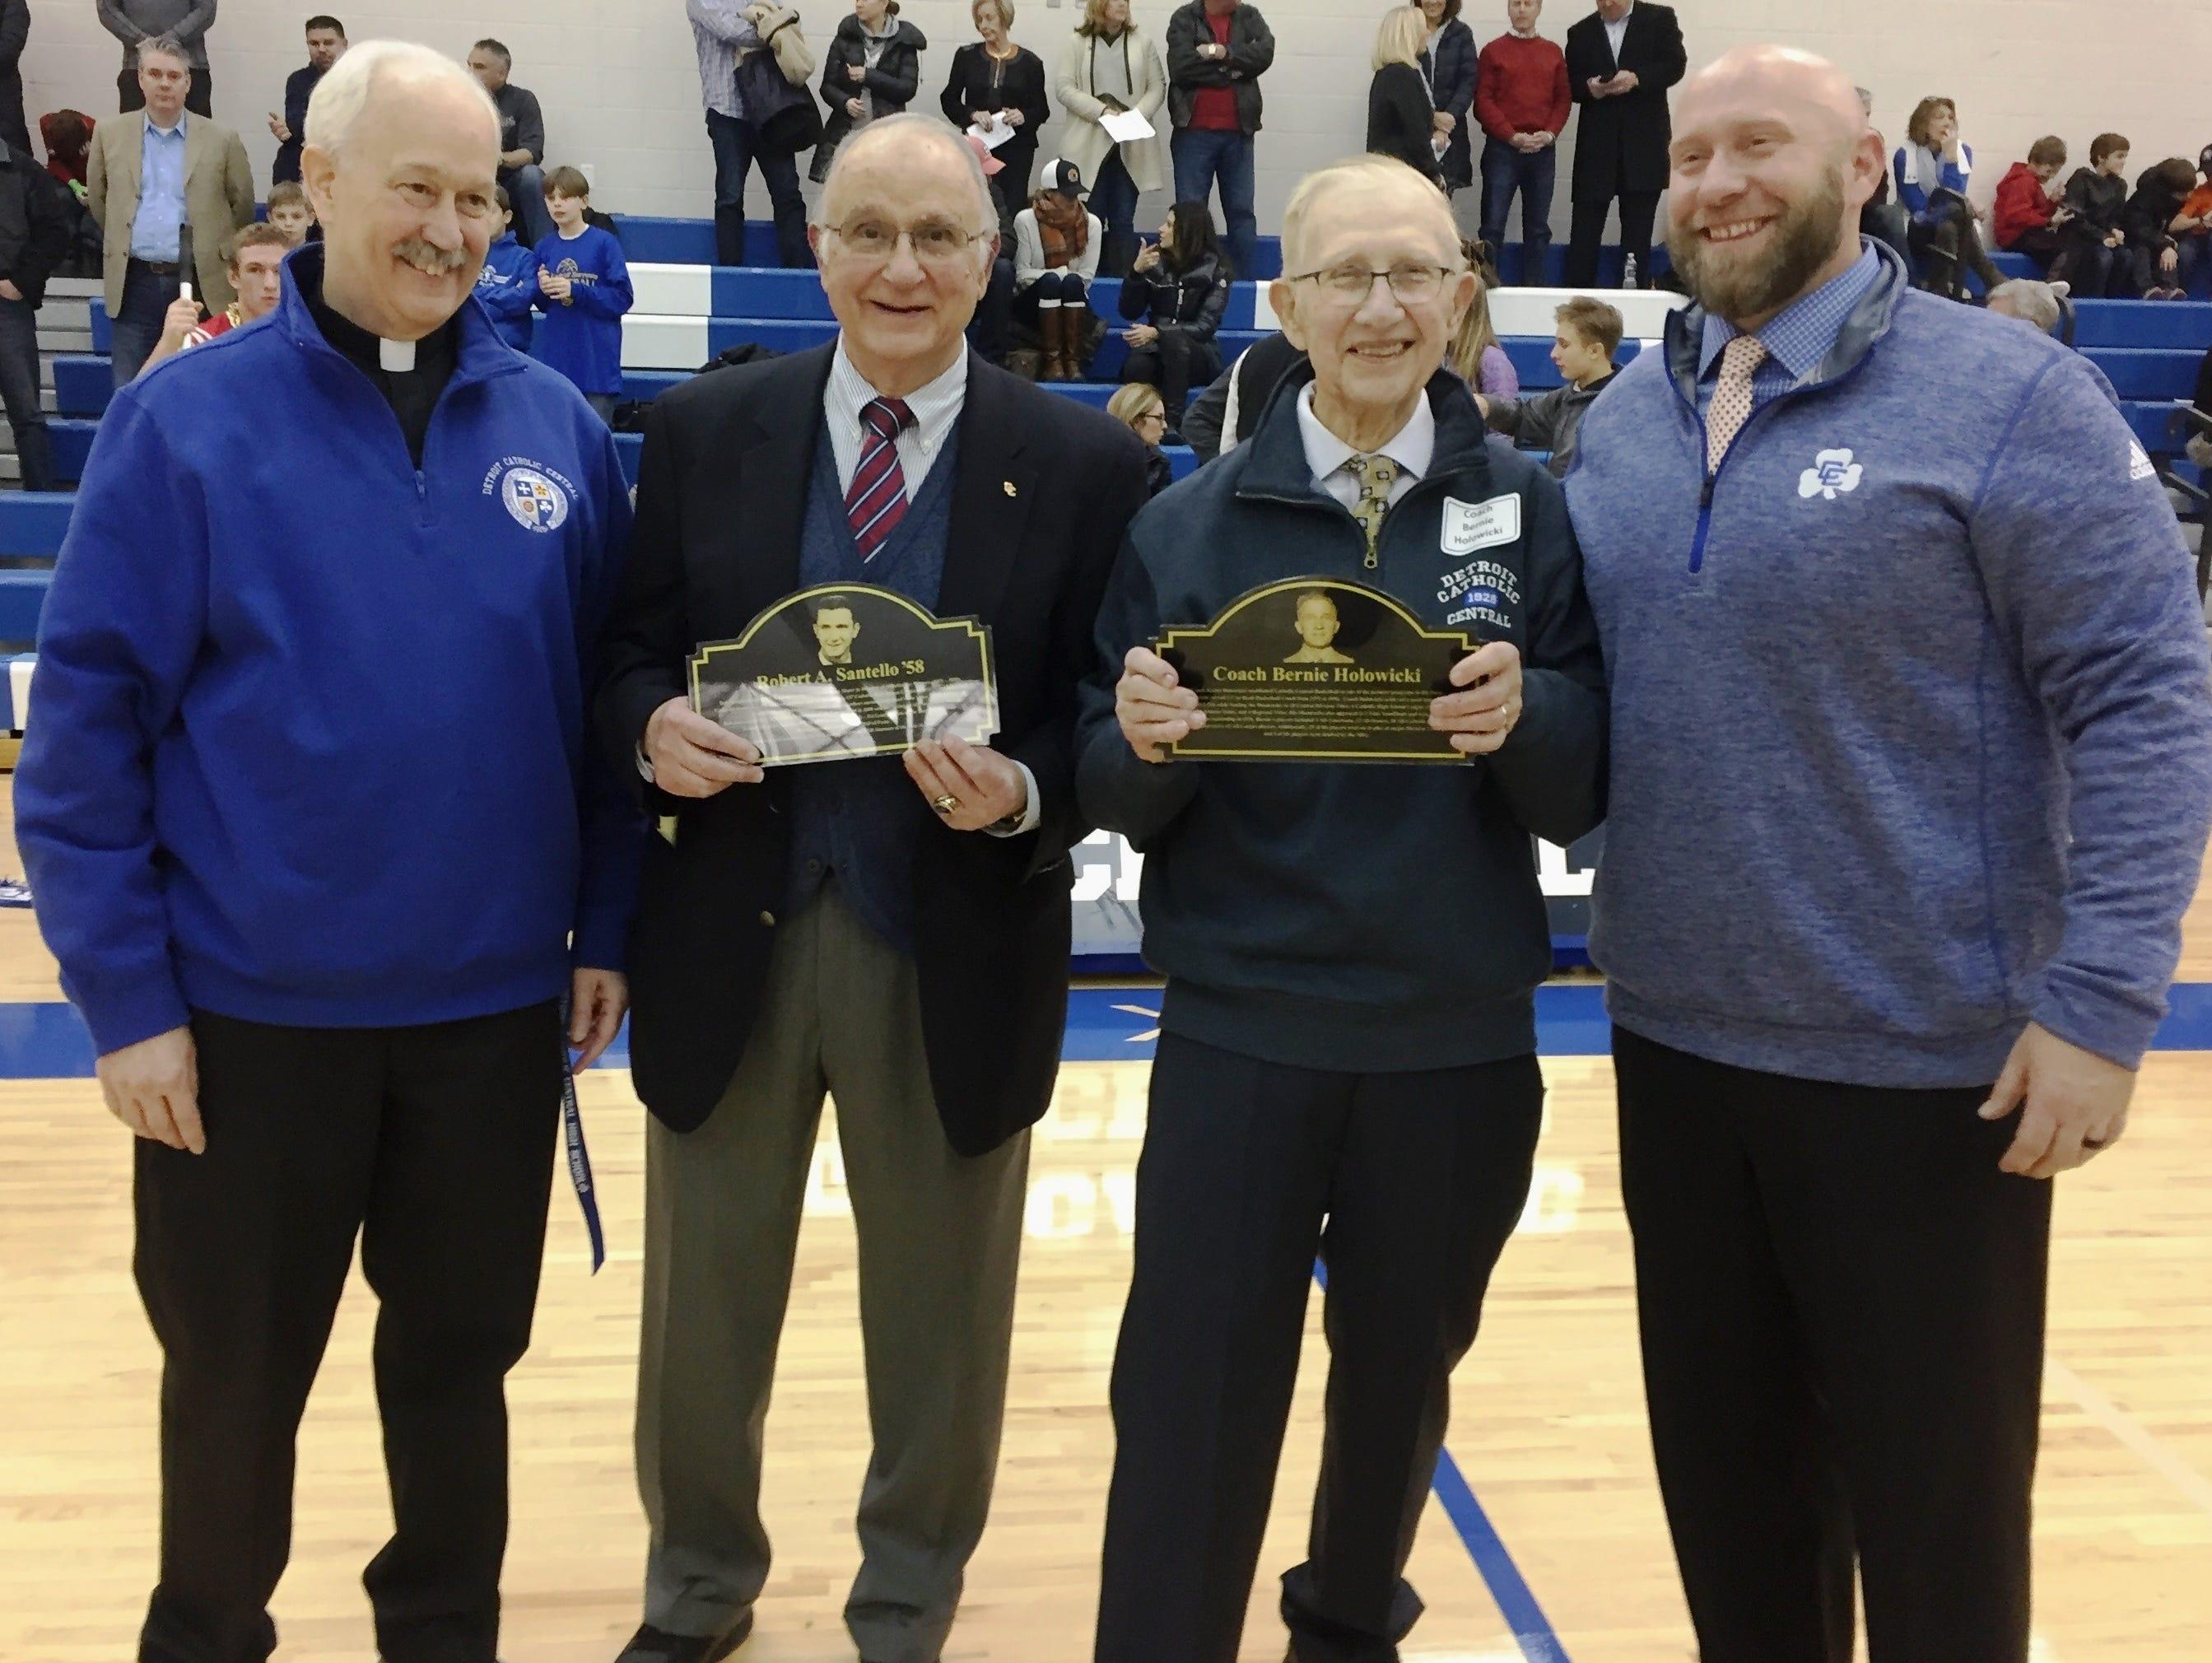 Catholic Central principal Fr. Dennis Noelke (far left) and current A.D. Aaron Babicz (far right) honored former A.D. Robert Santello and basketball coach Bernie Holowicki.